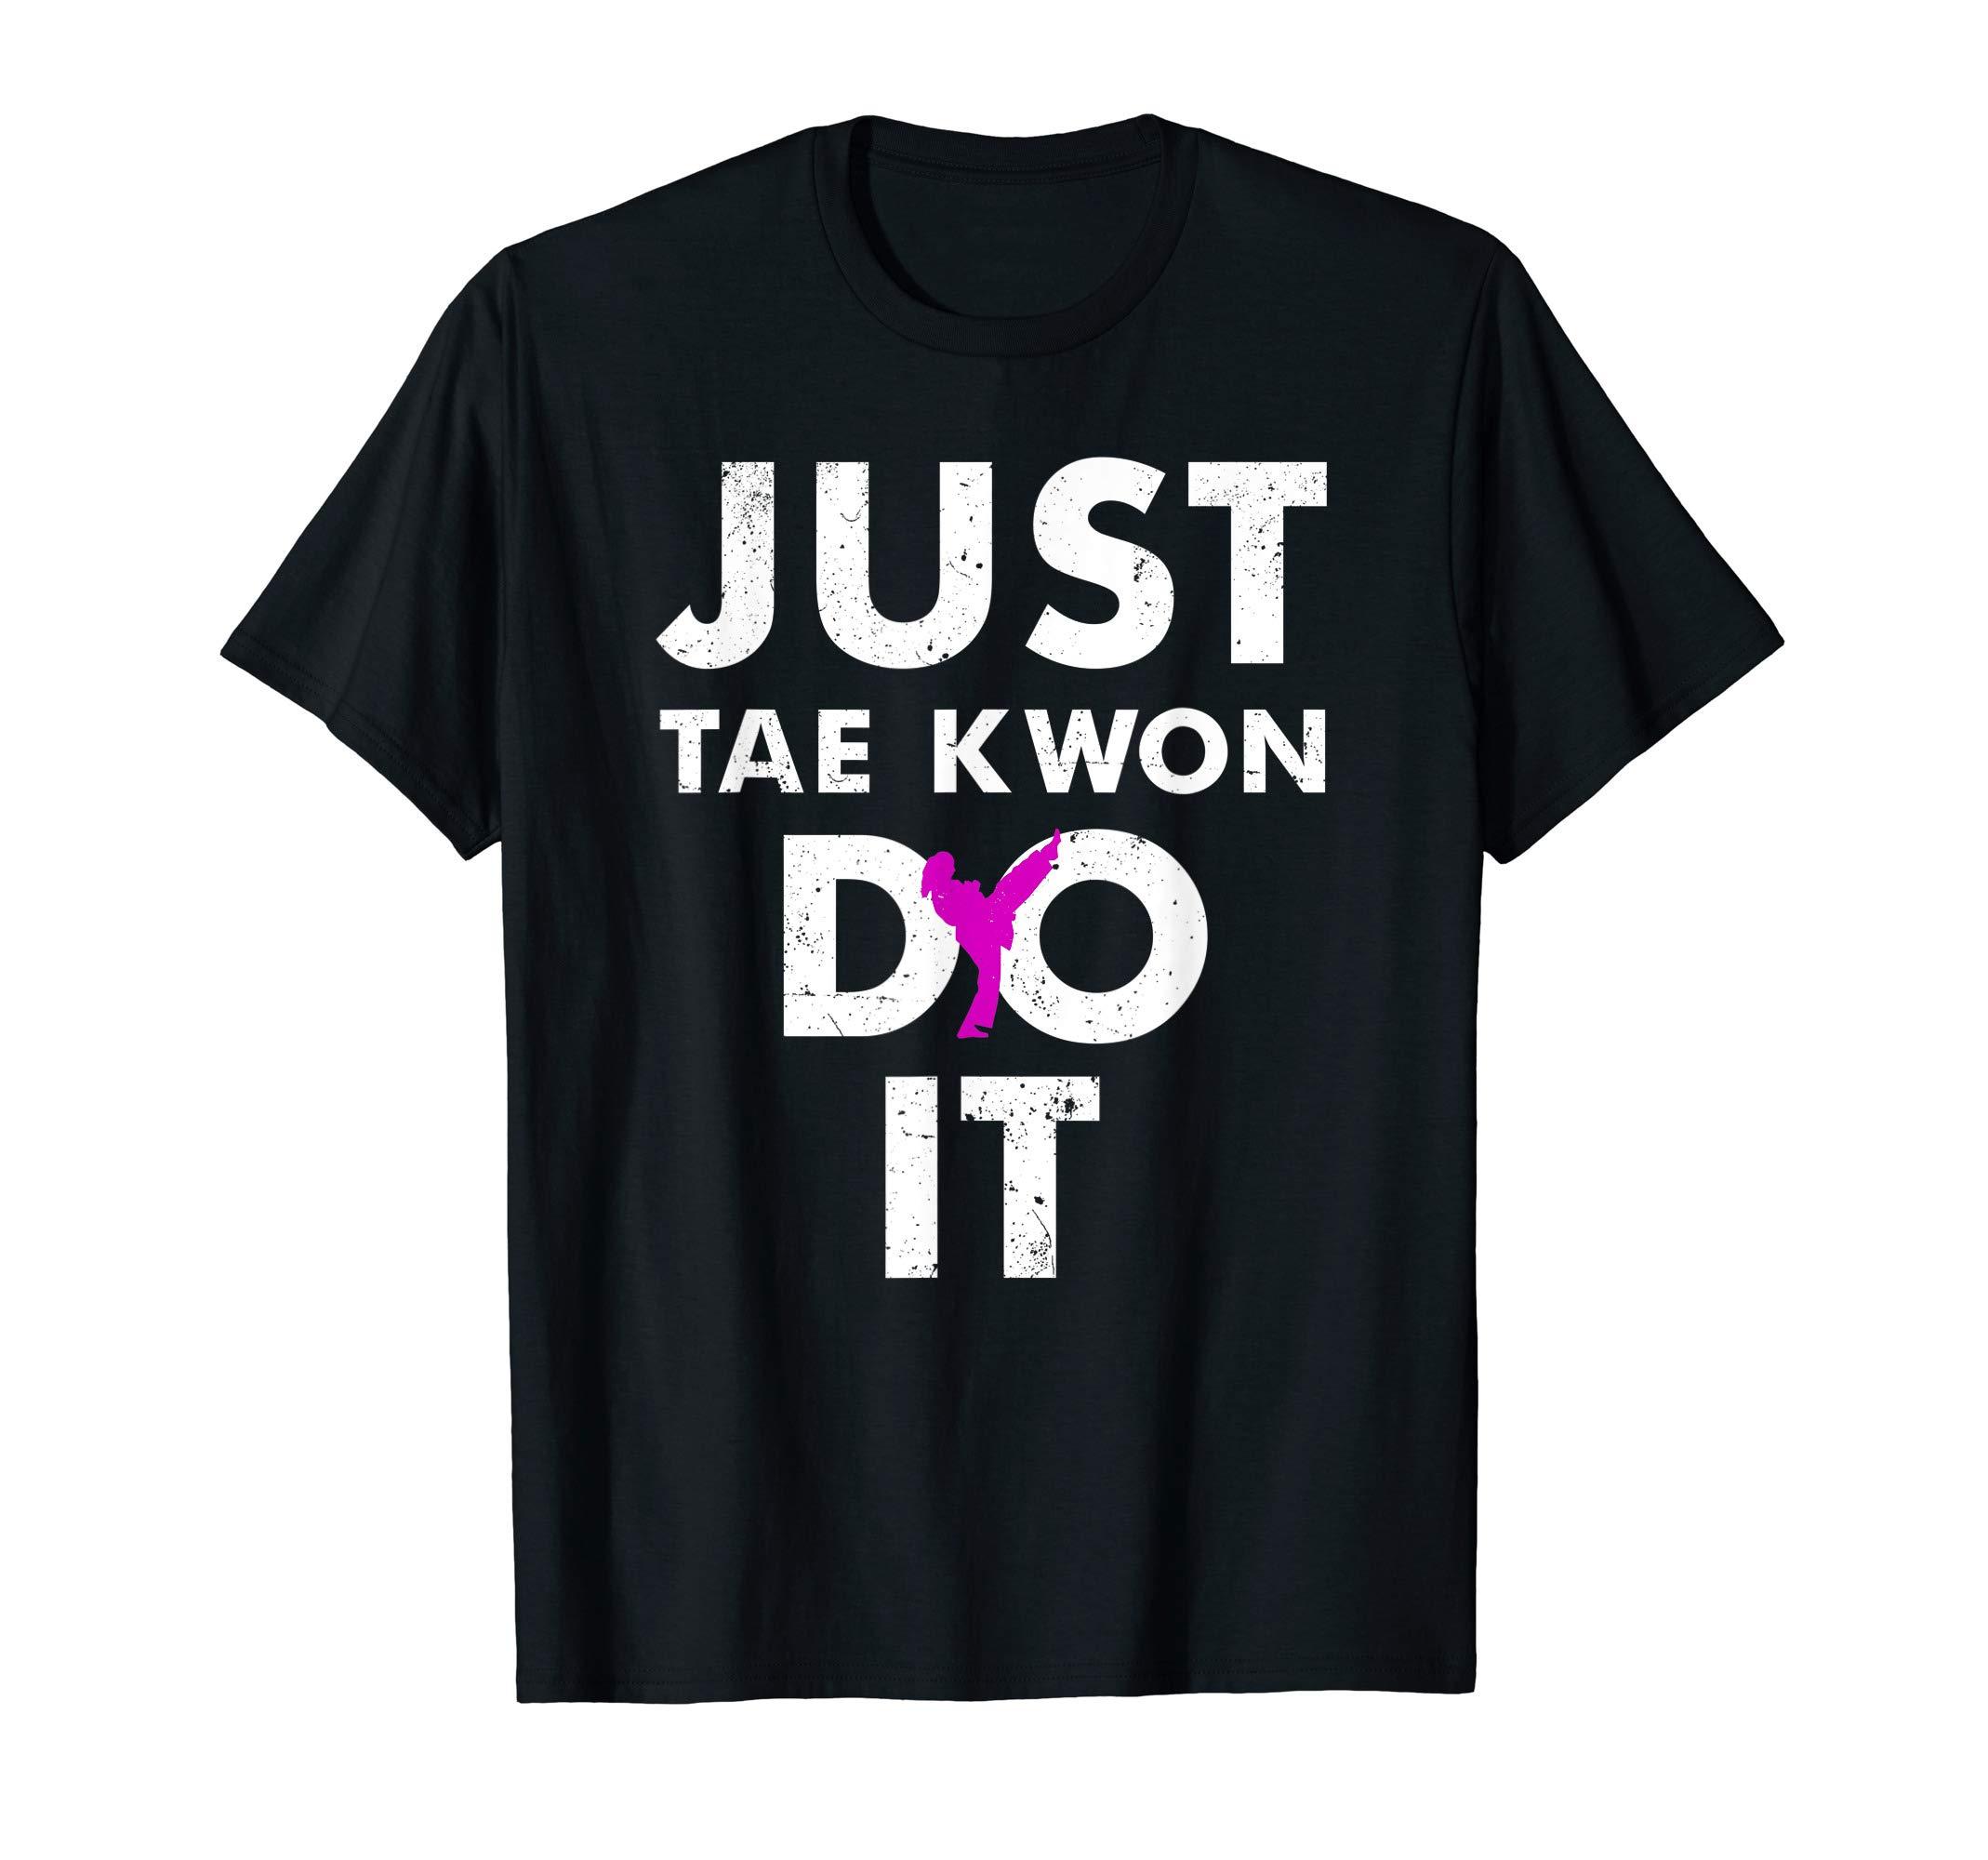 Taekwondo Karate Tshirt Just Tae Kwon DO IT by TaeKwonDo T-Shirts